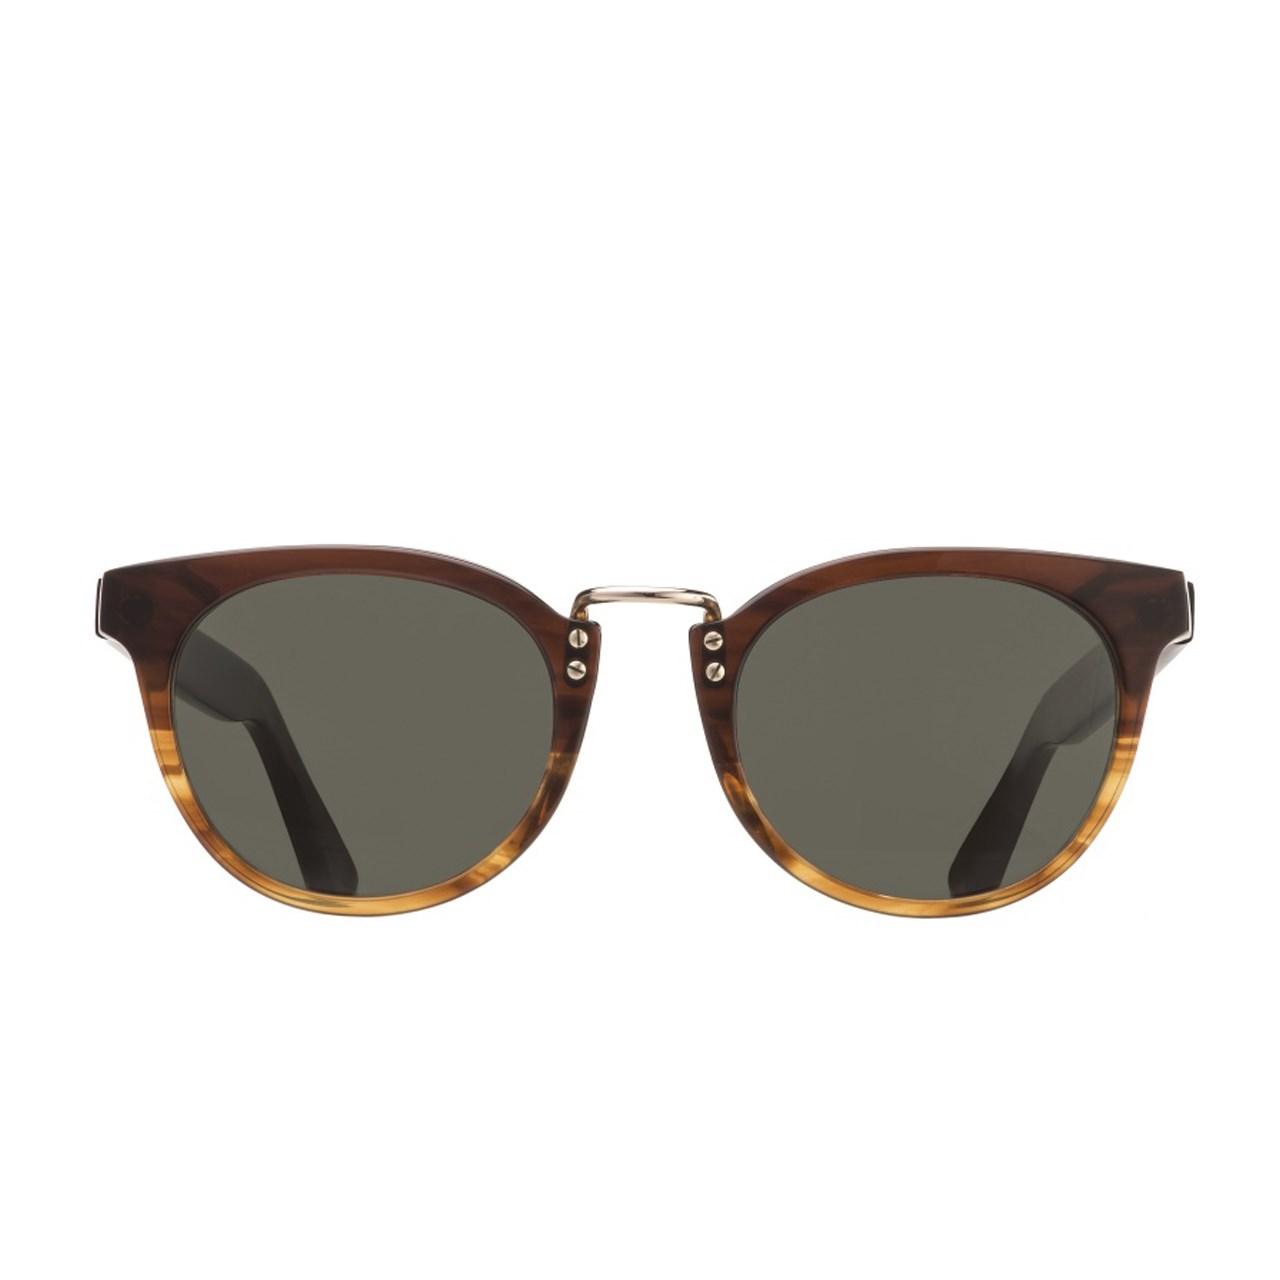 عینک آفتابی ماسادا مدل Untitle II S3146-WLT